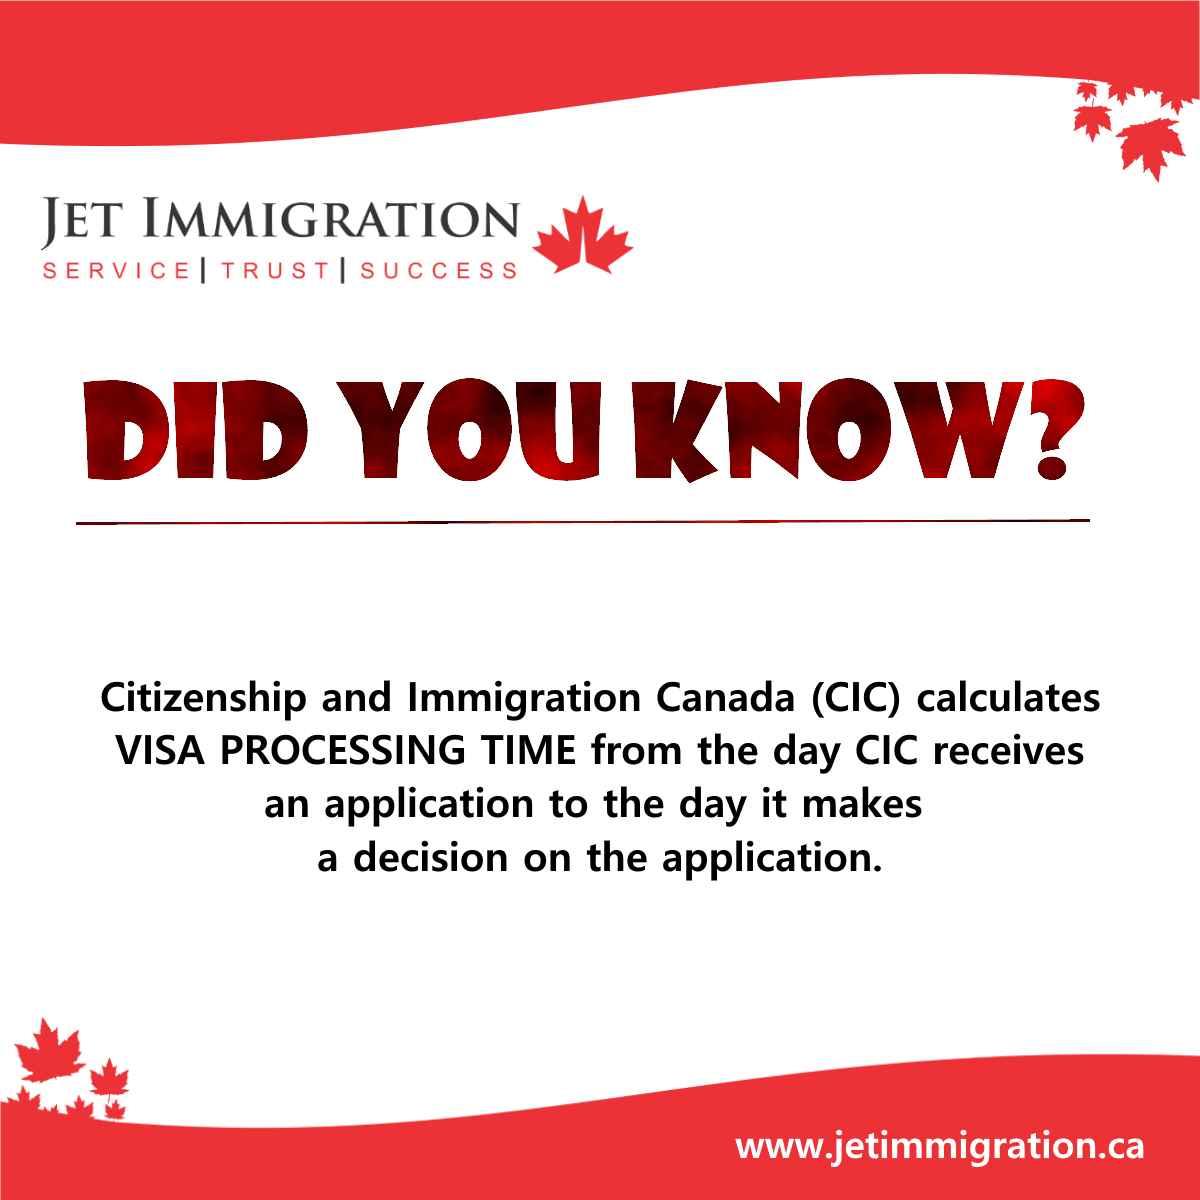 Jet Immigration on Twitter: